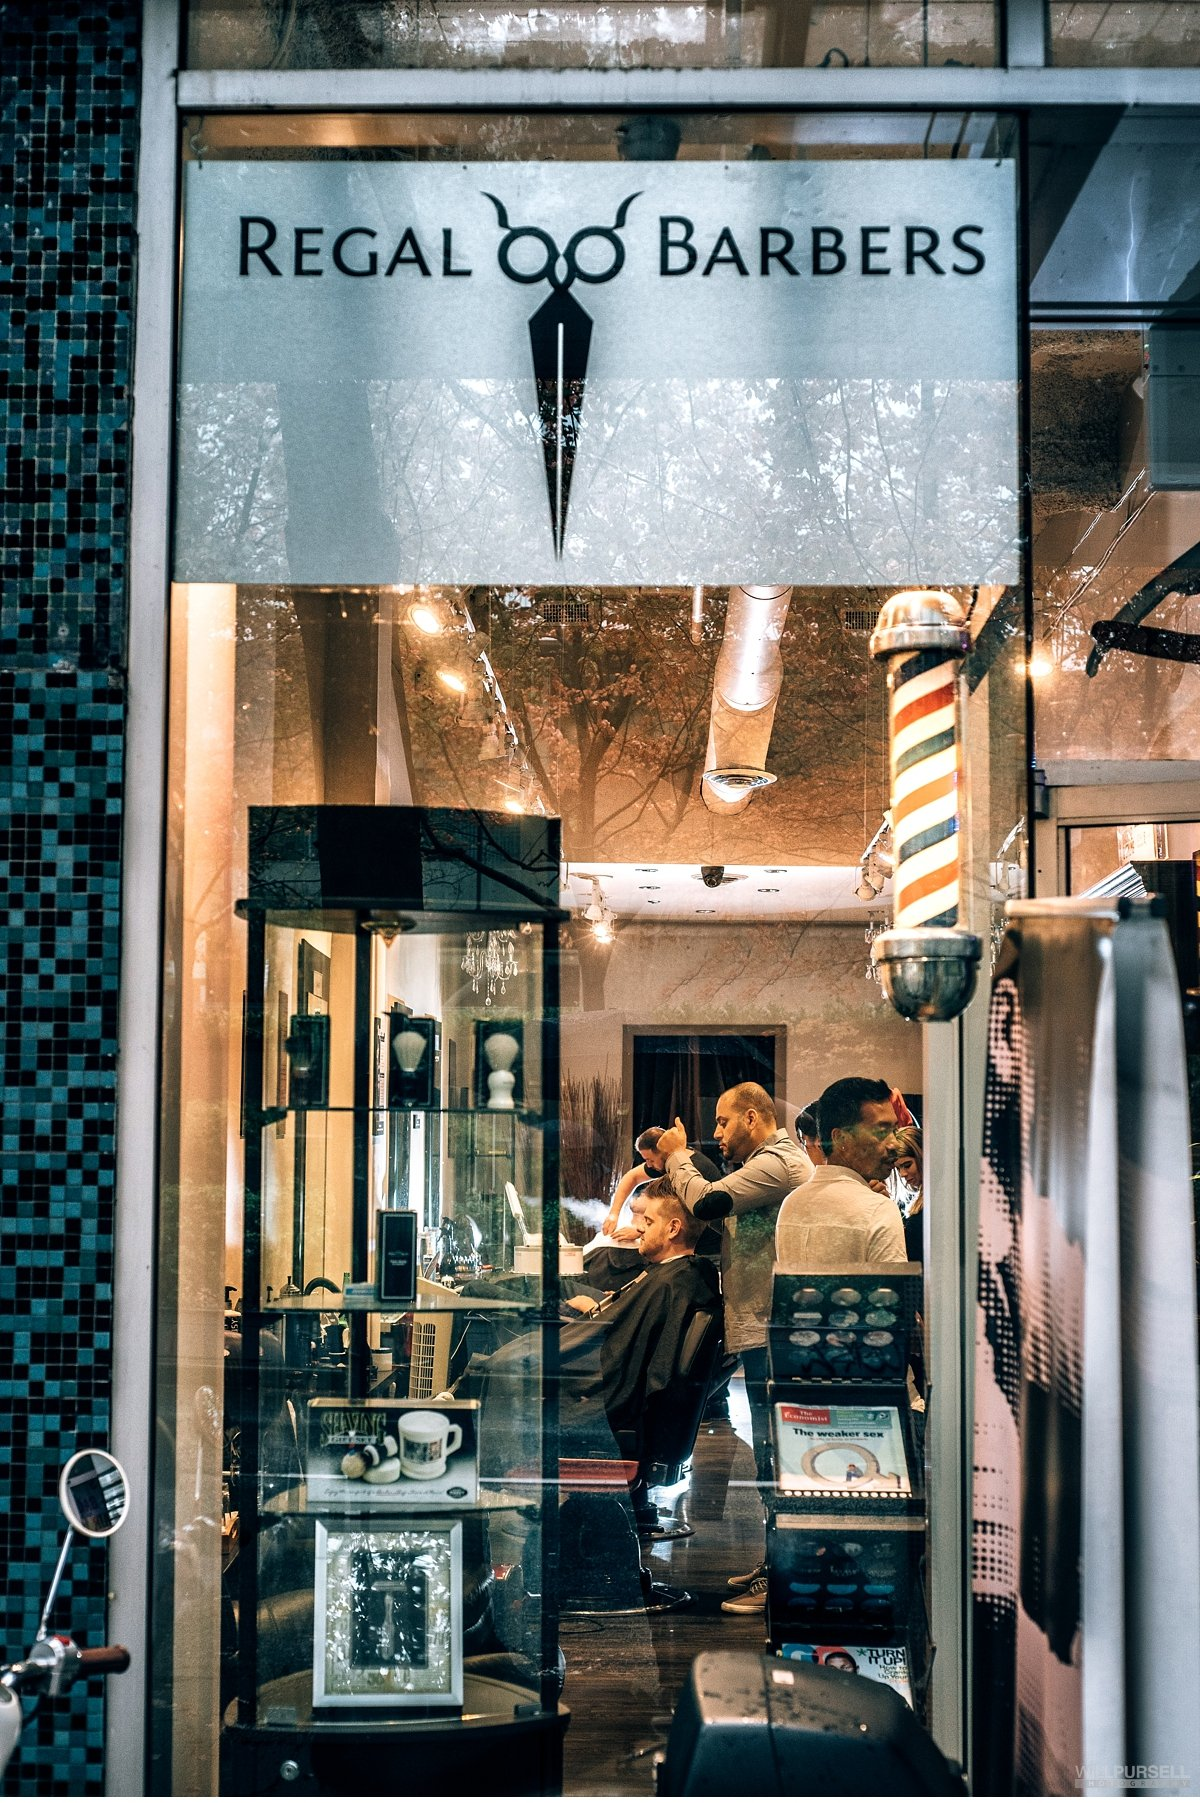 wedding barbershop